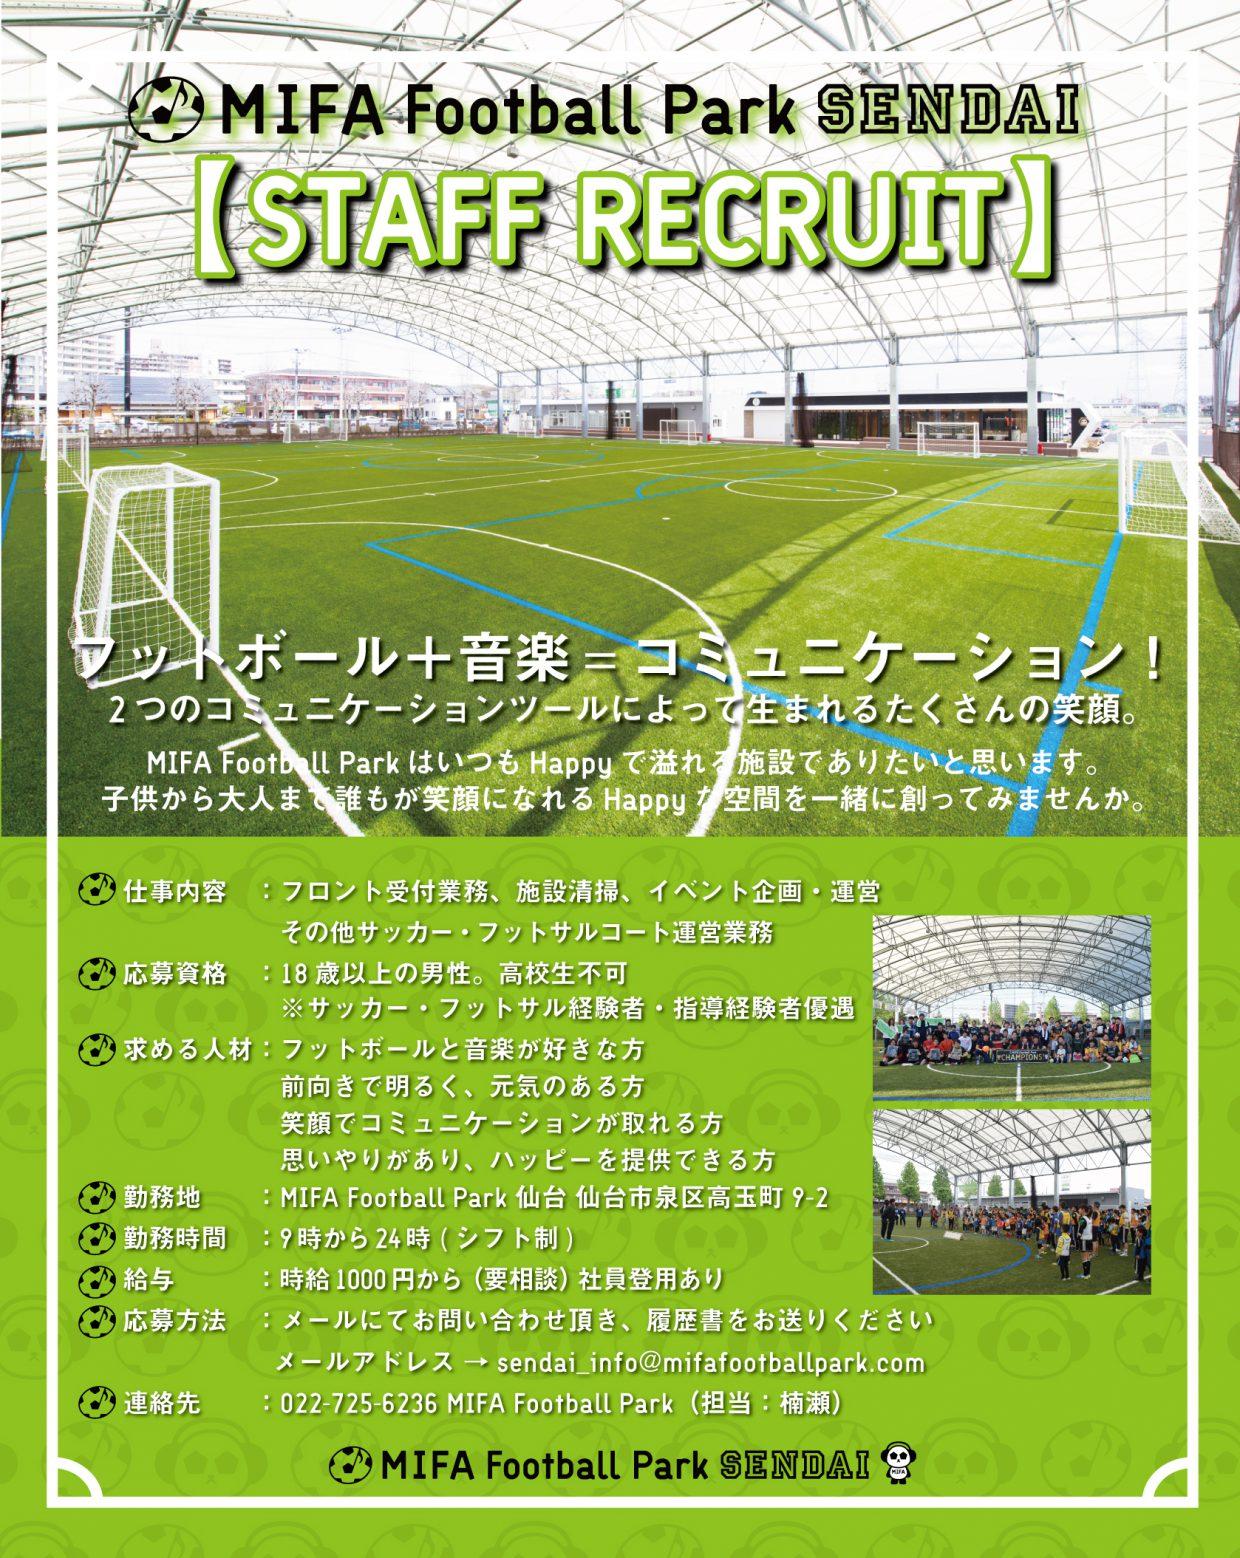 MIFA Football Park 仙台 リクルート【スタッフ募集中!】